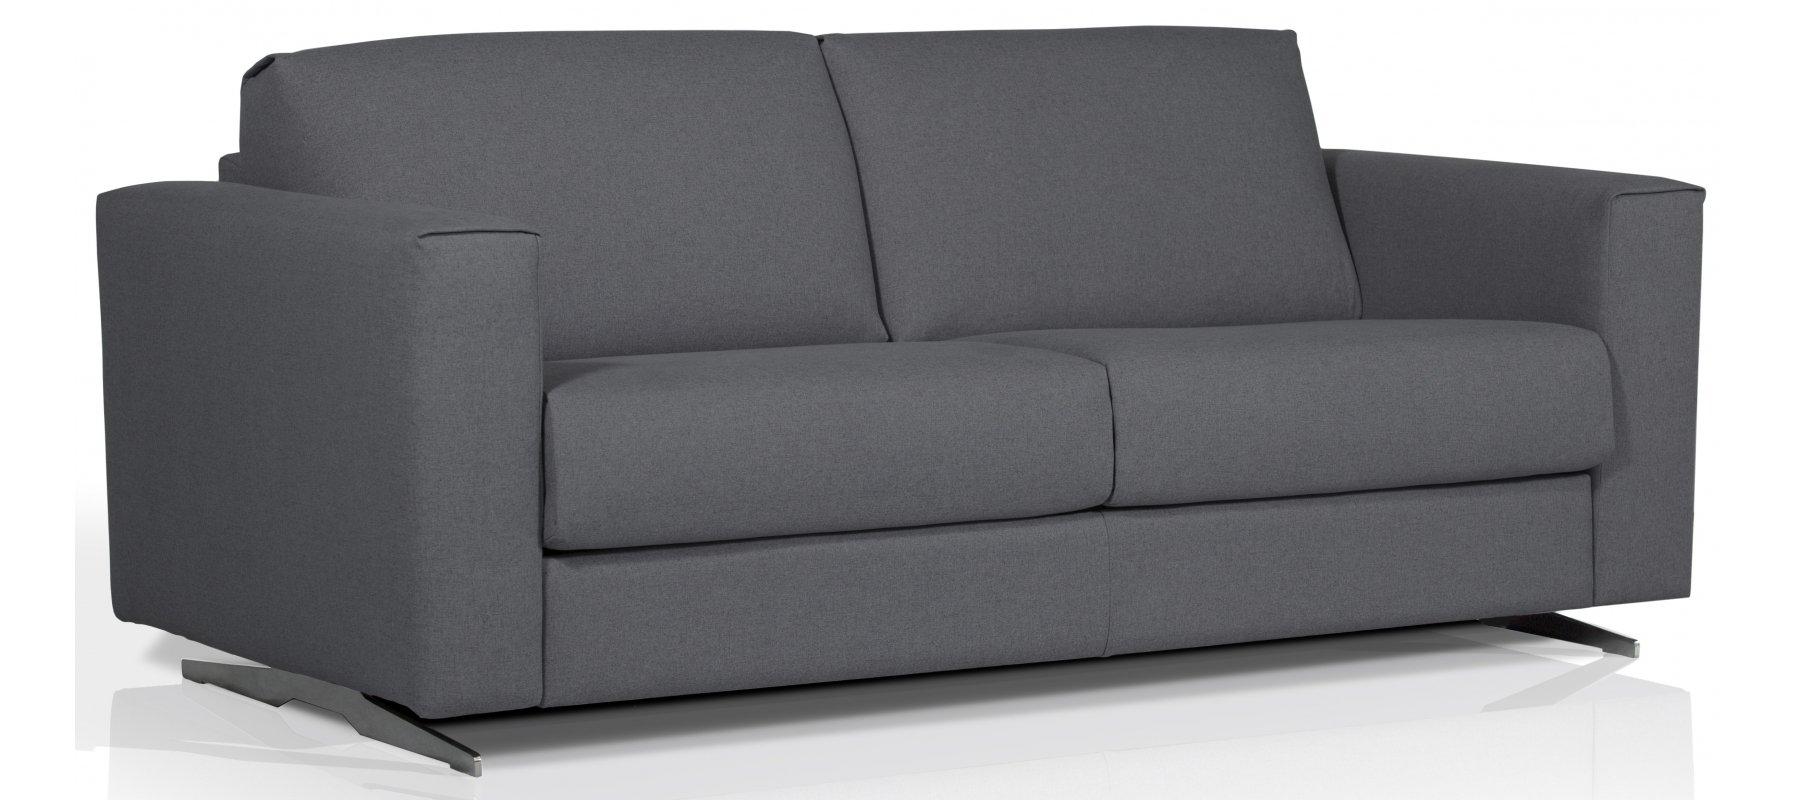 canap convertible chic largeur 170 cm couchage 120 cm. Black Bedroom Furniture Sets. Home Design Ideas